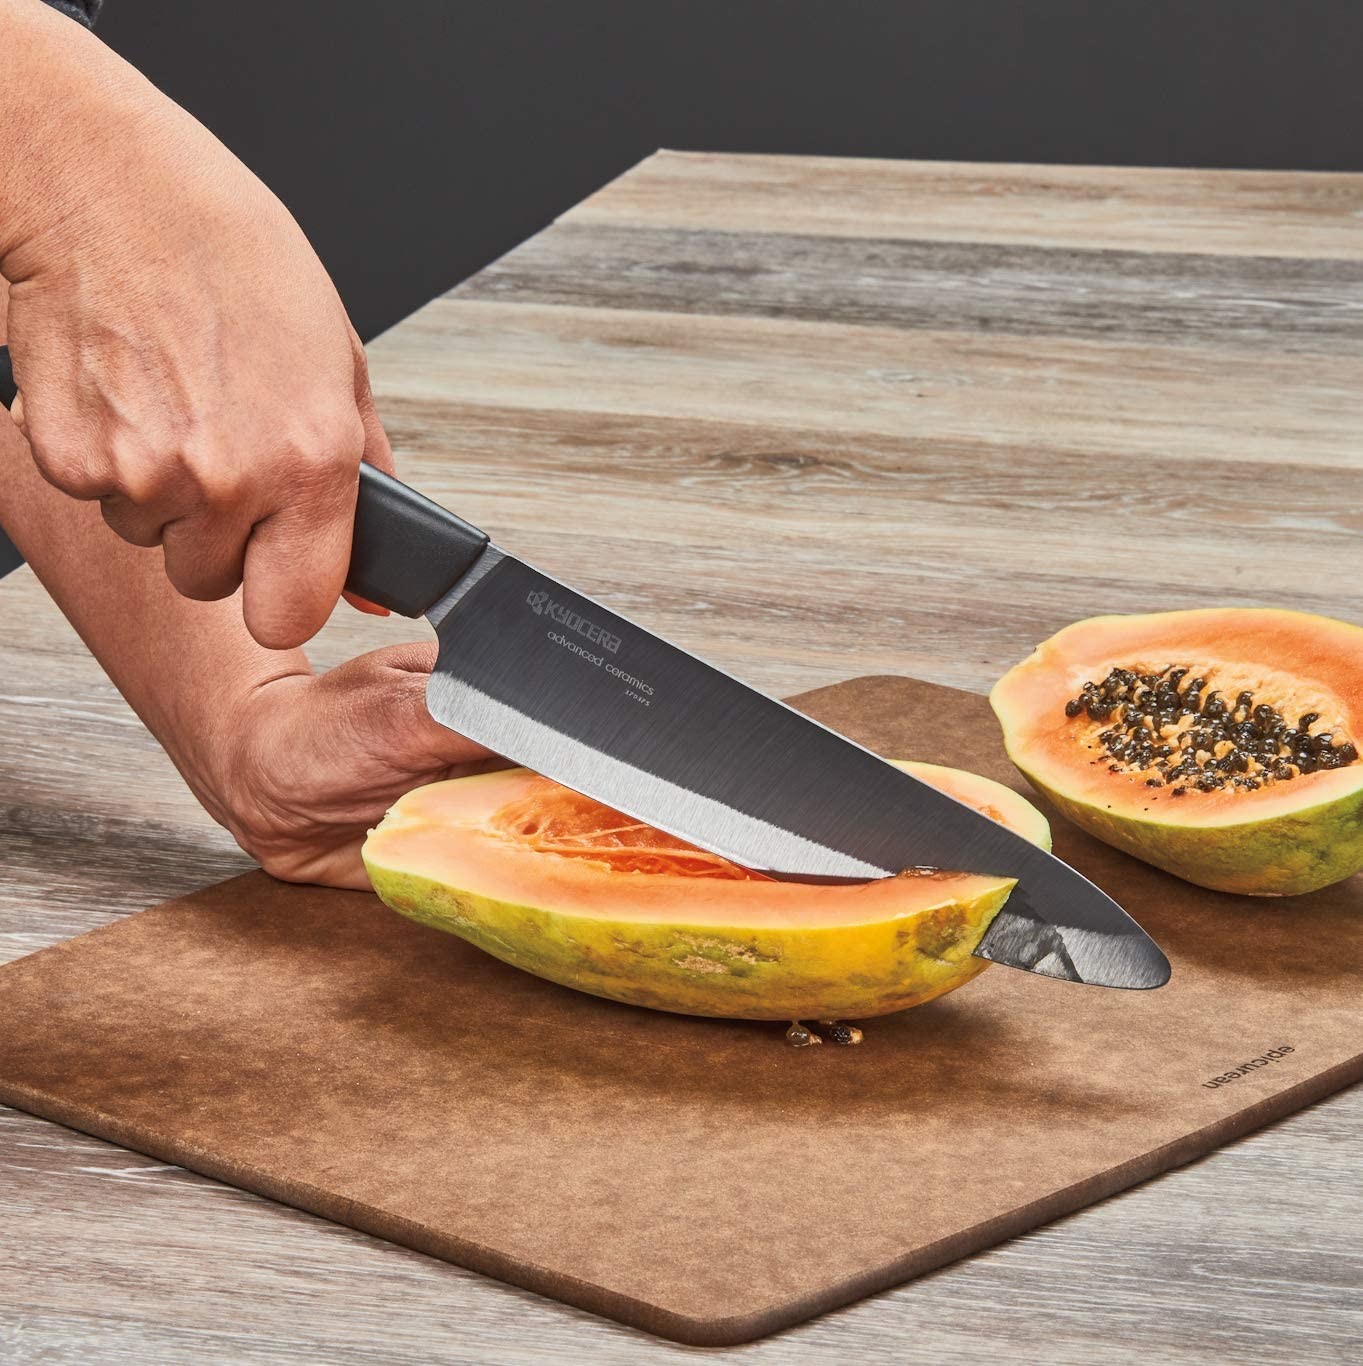 Kyocera Advanced Ceramic Revolution Series 7-inch Professional Chef's Knife